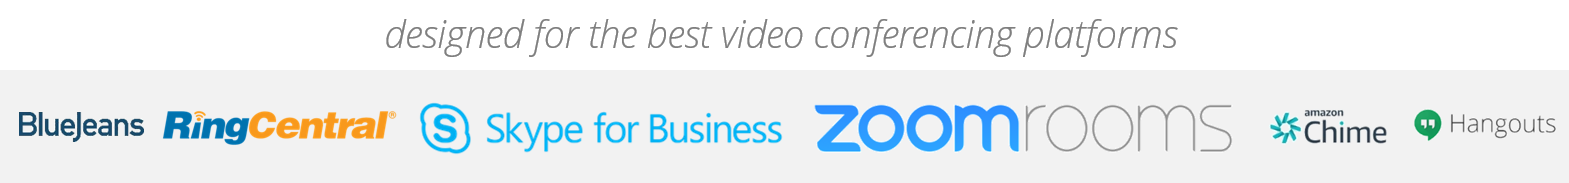 Market Leading Video Conference Platforms